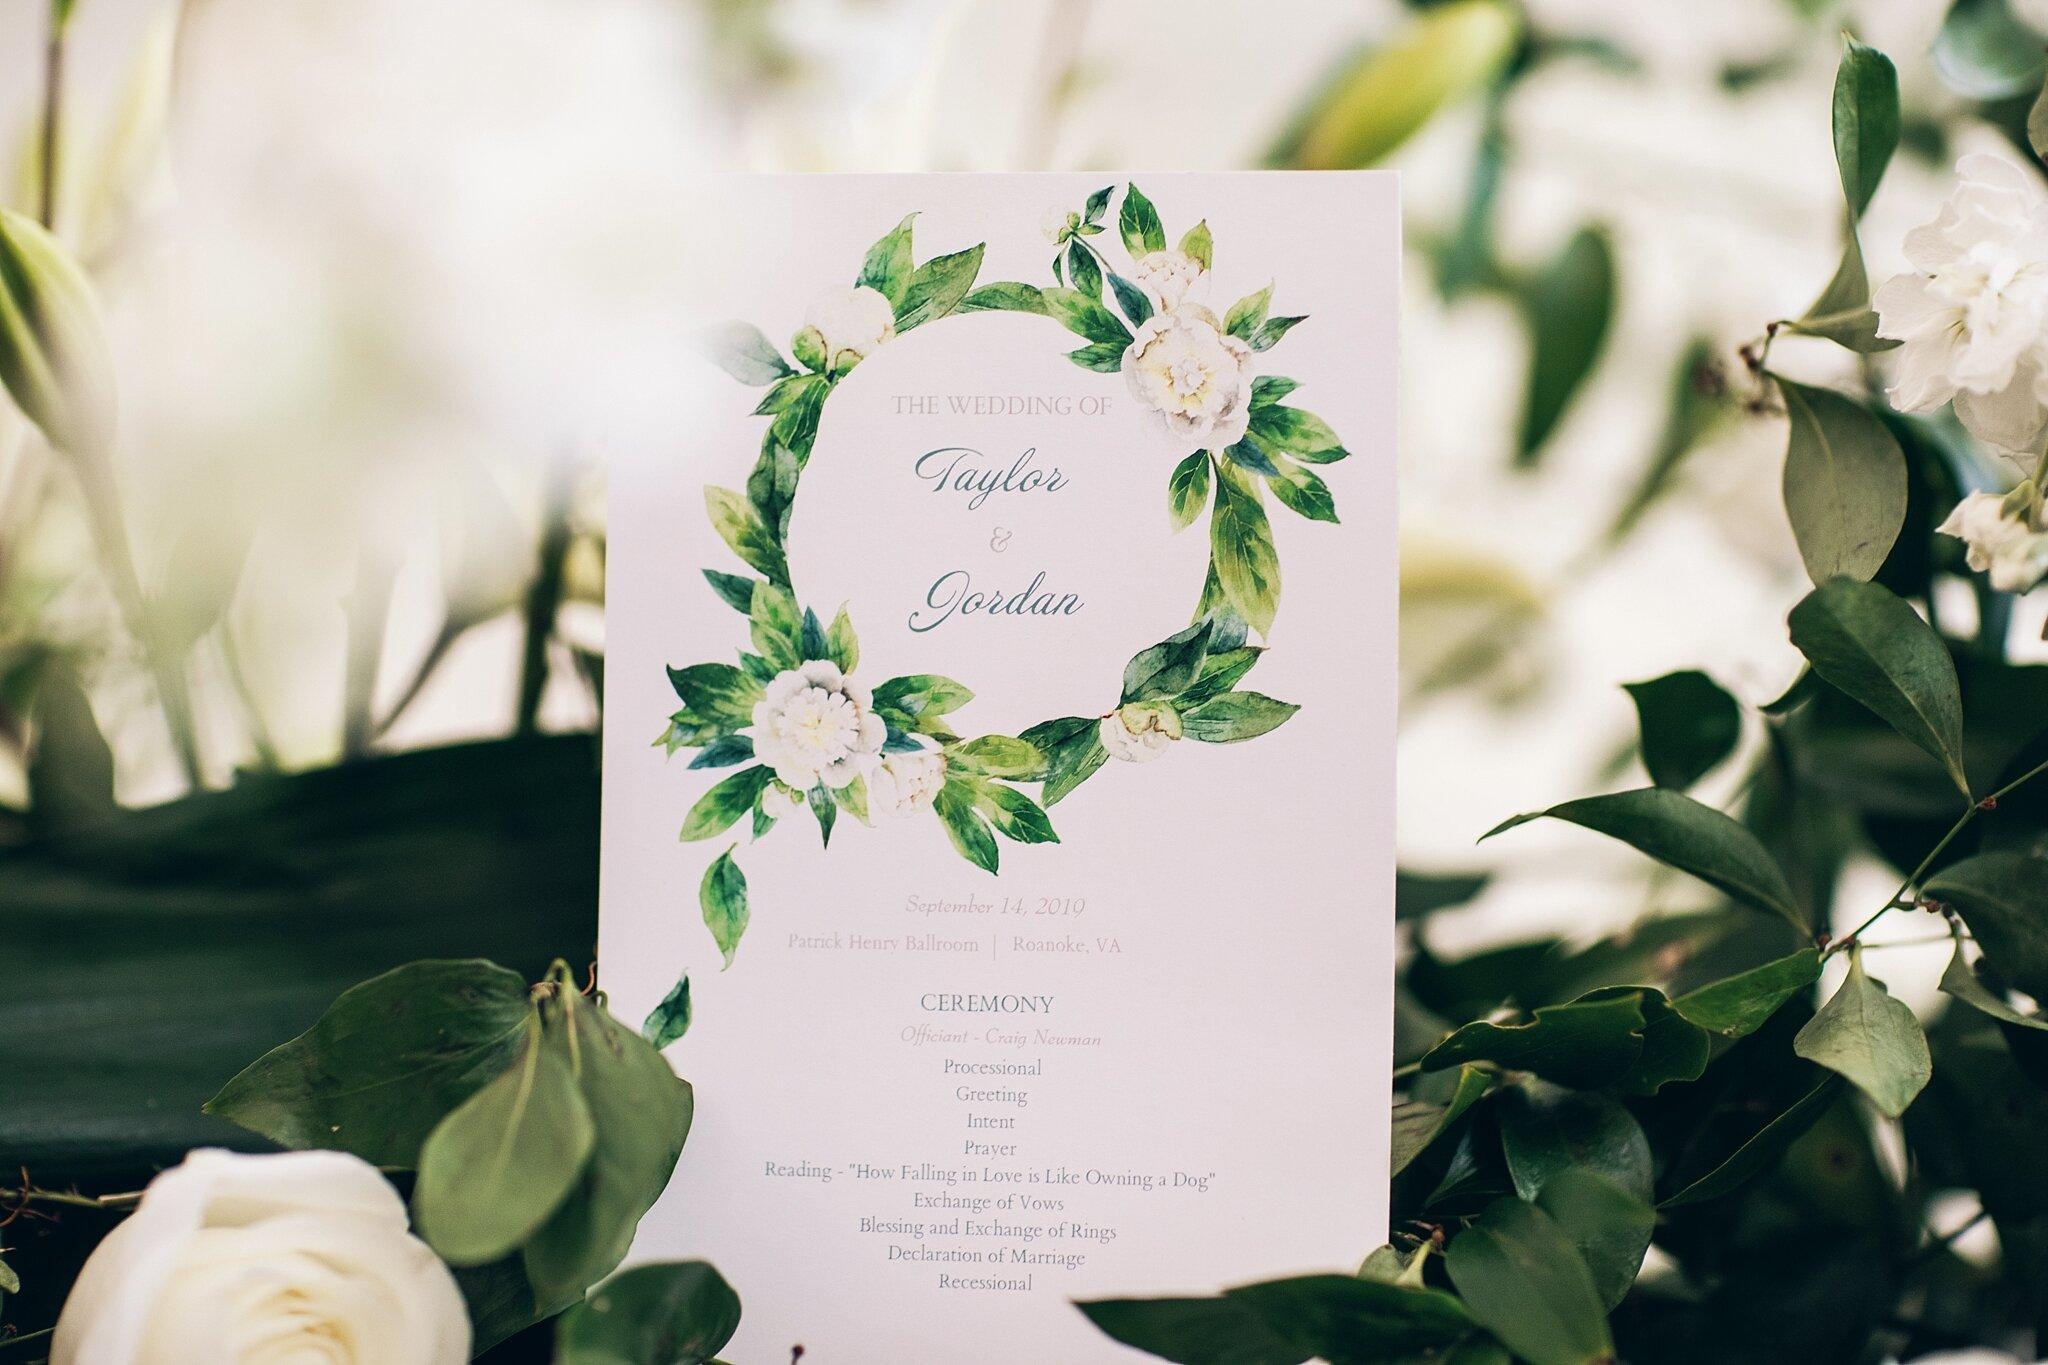 patrick-henry-ballroom-wedding-roanoke_0491.jpg